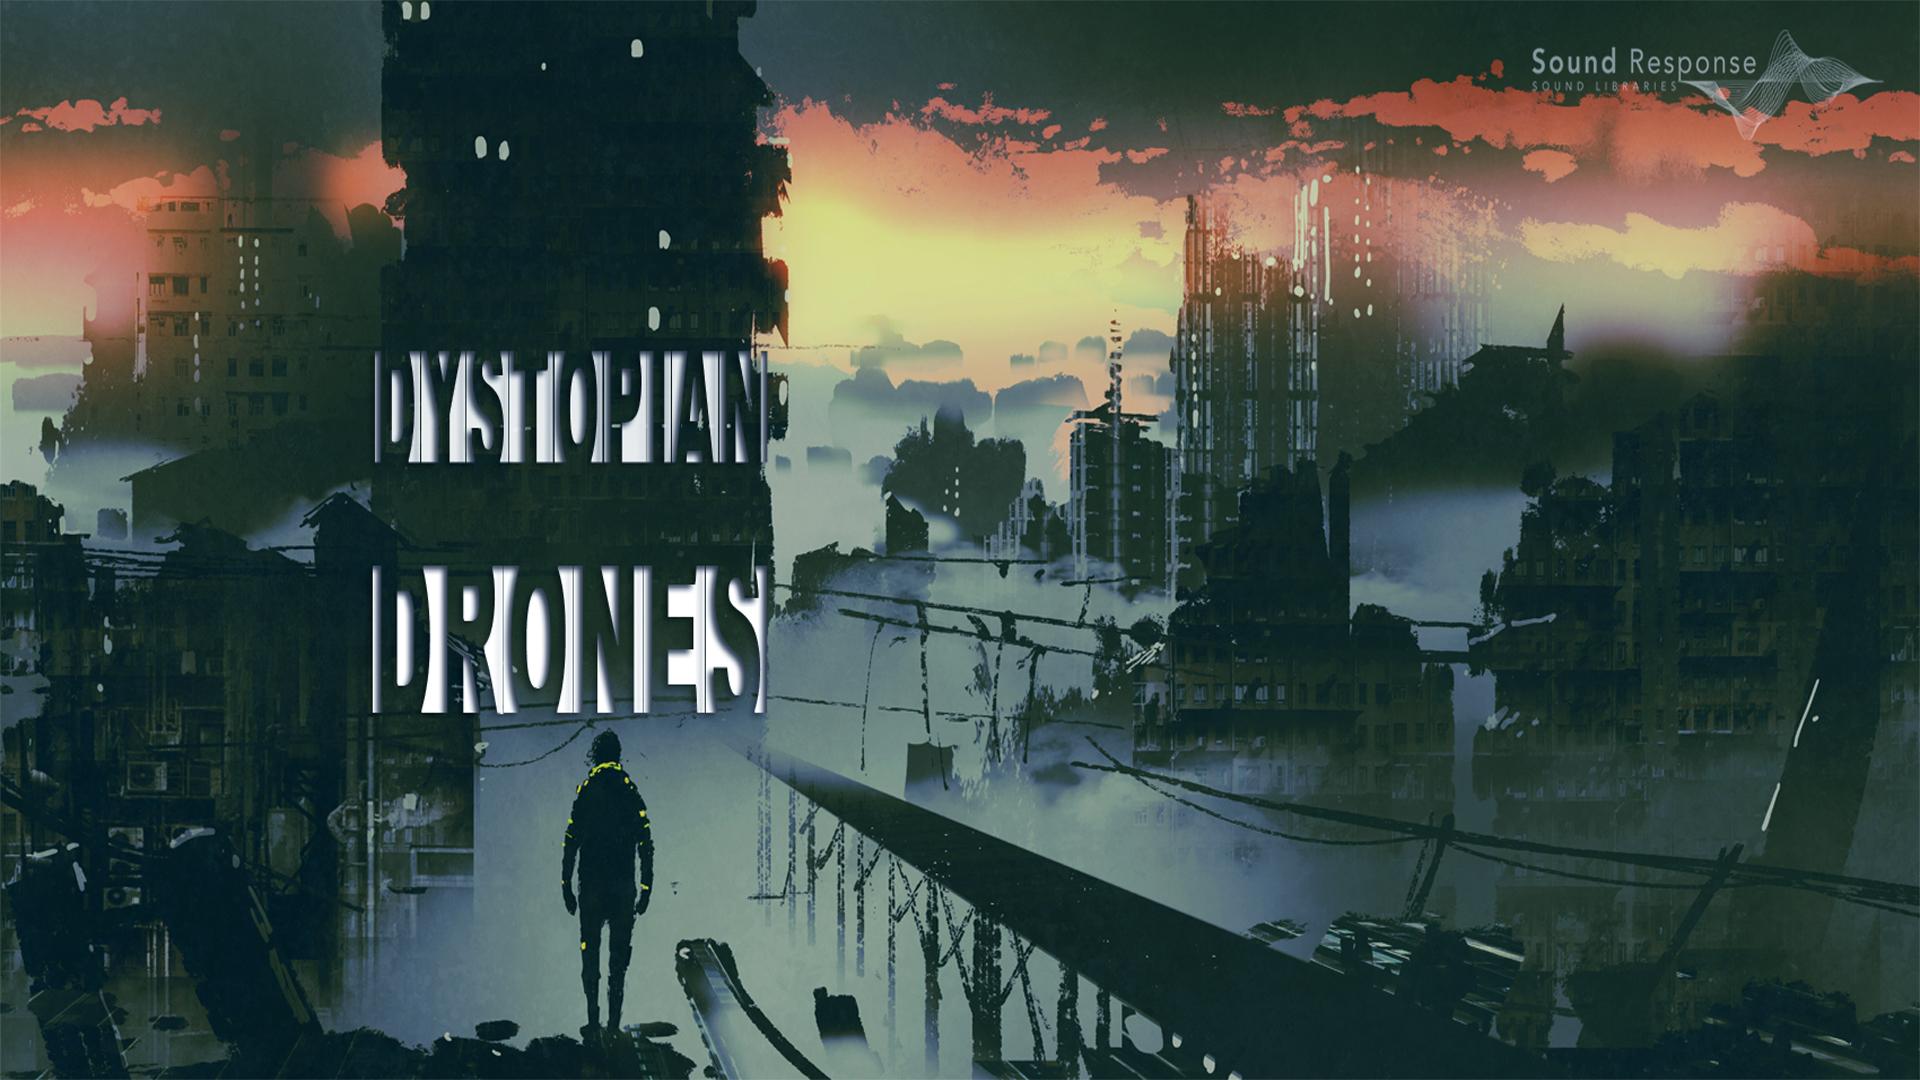 Dark Drones, Dark Ambiences, Horror Soundscapes by Sound